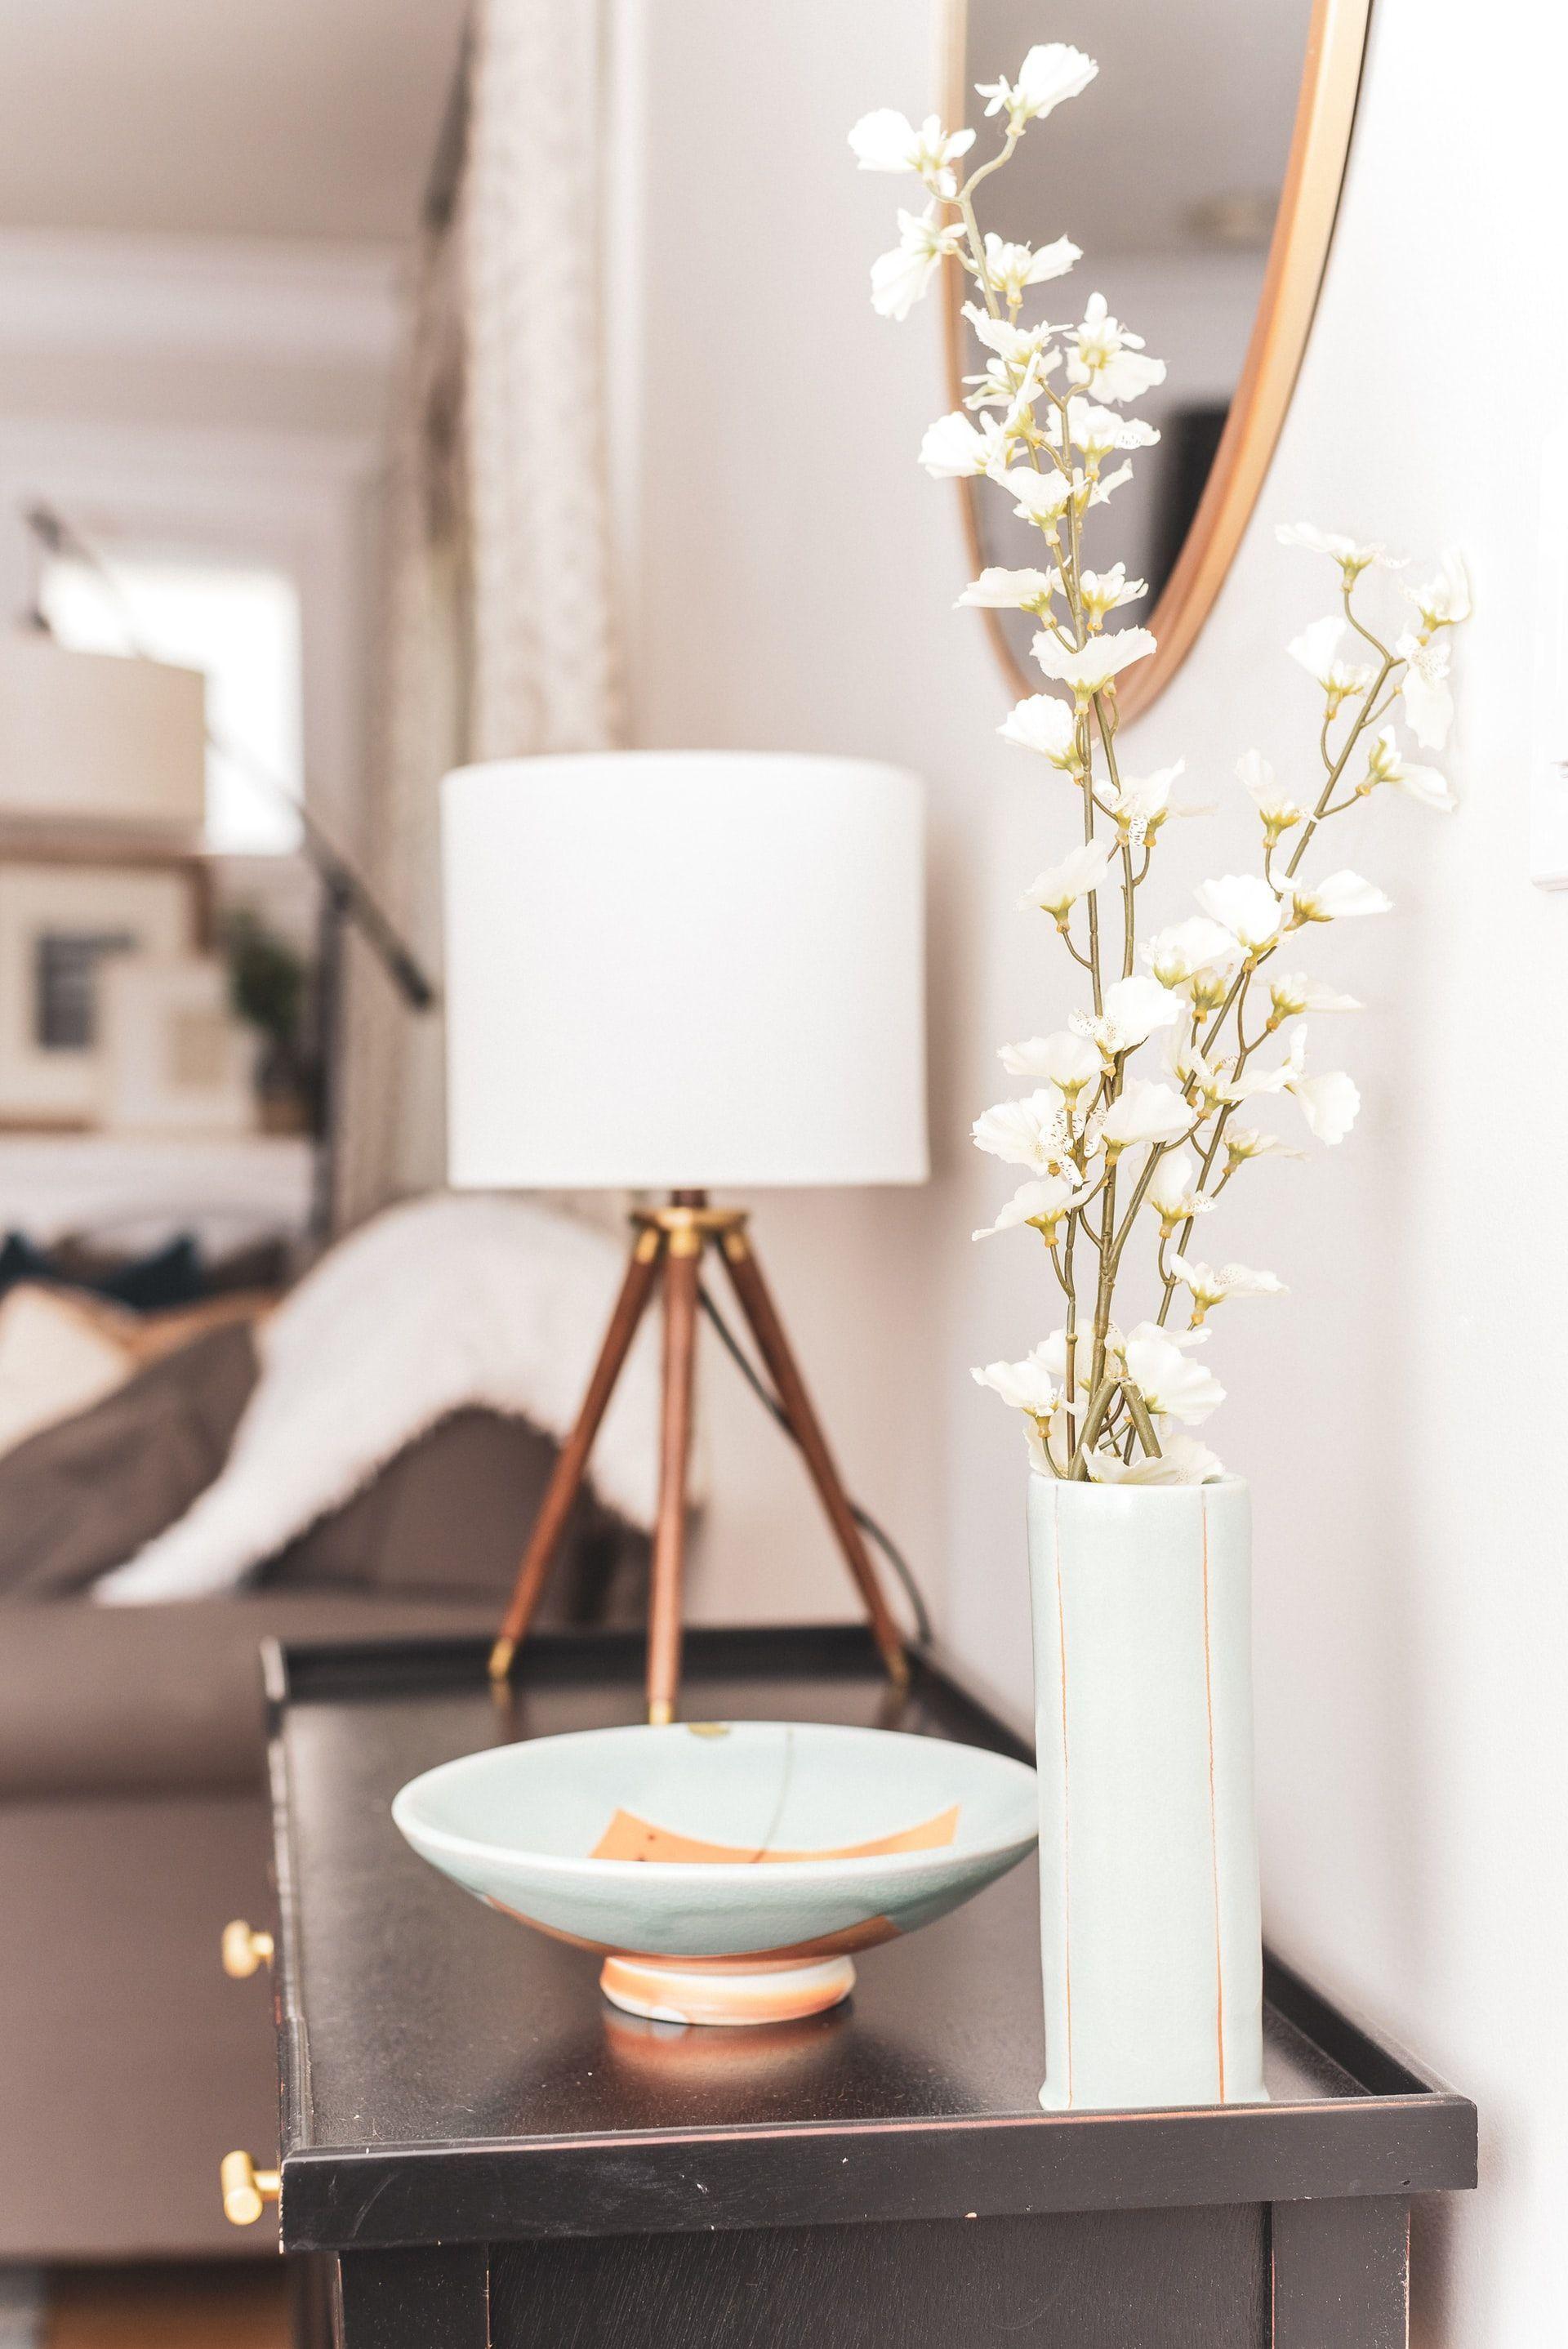 Plant Decoration In Living Room Kukun Home Interior Design Interior Design Pictures Decor